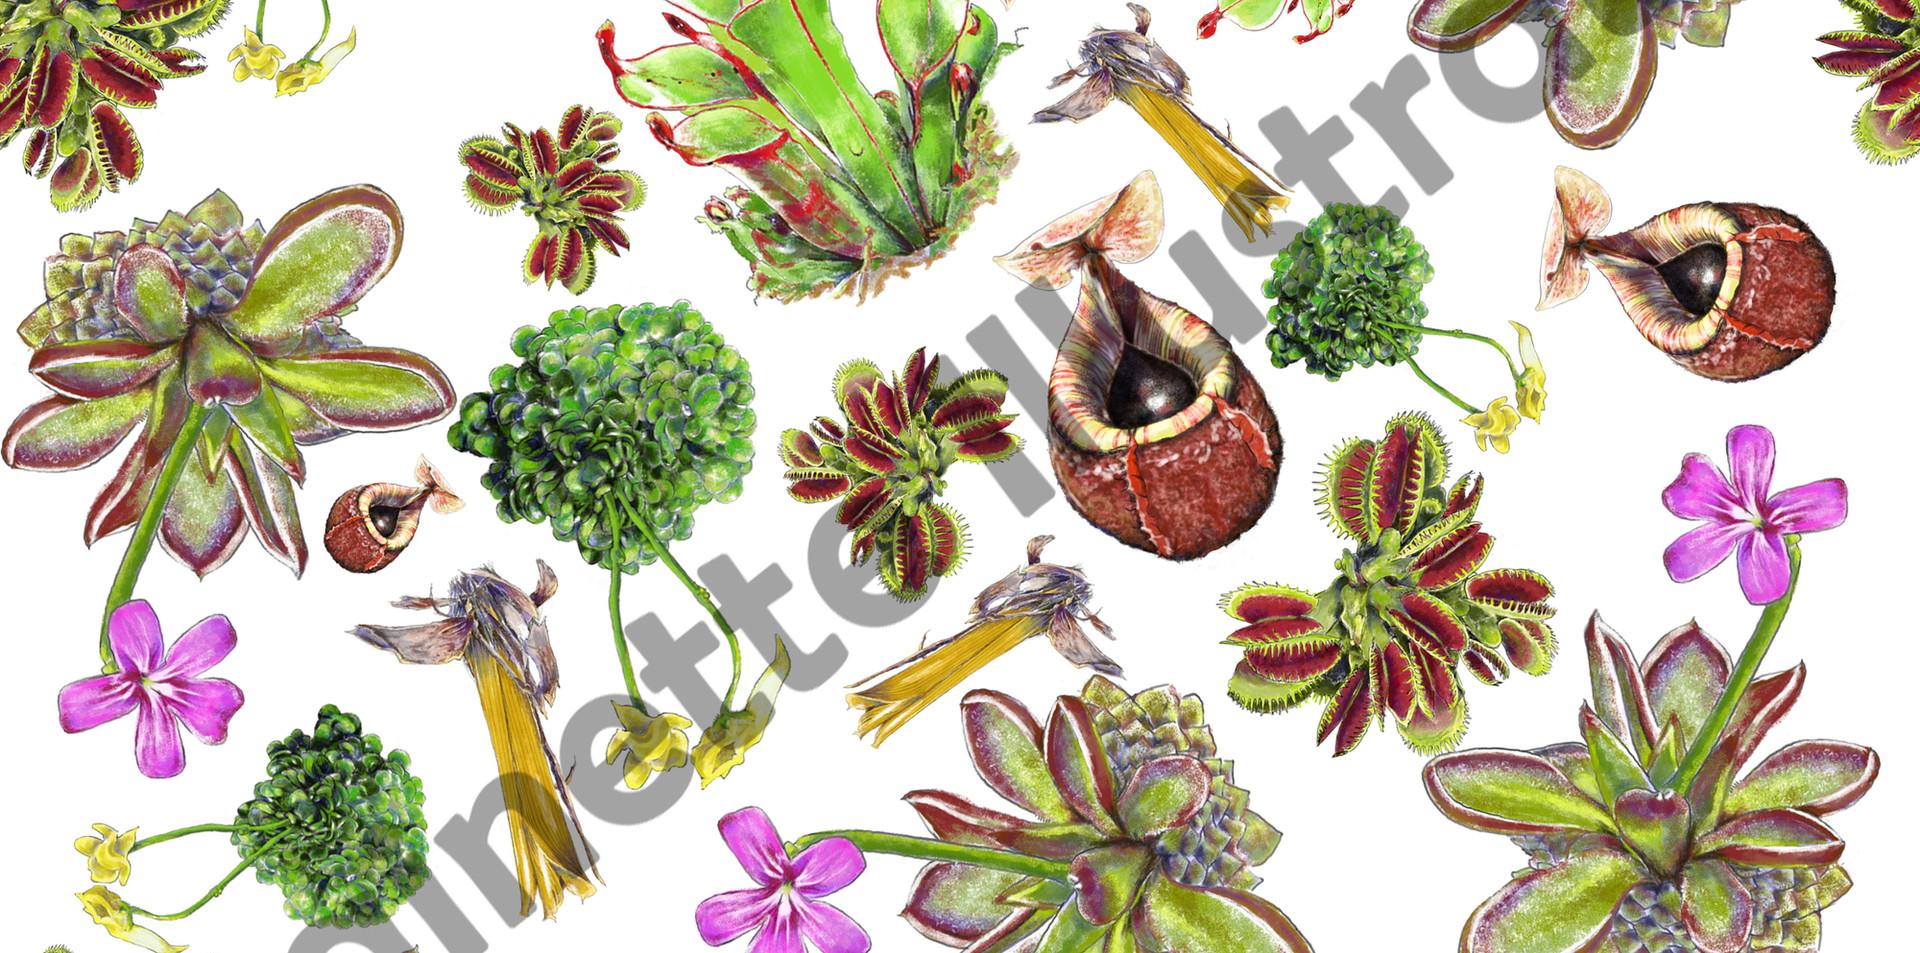 carnivorousplants.jpg